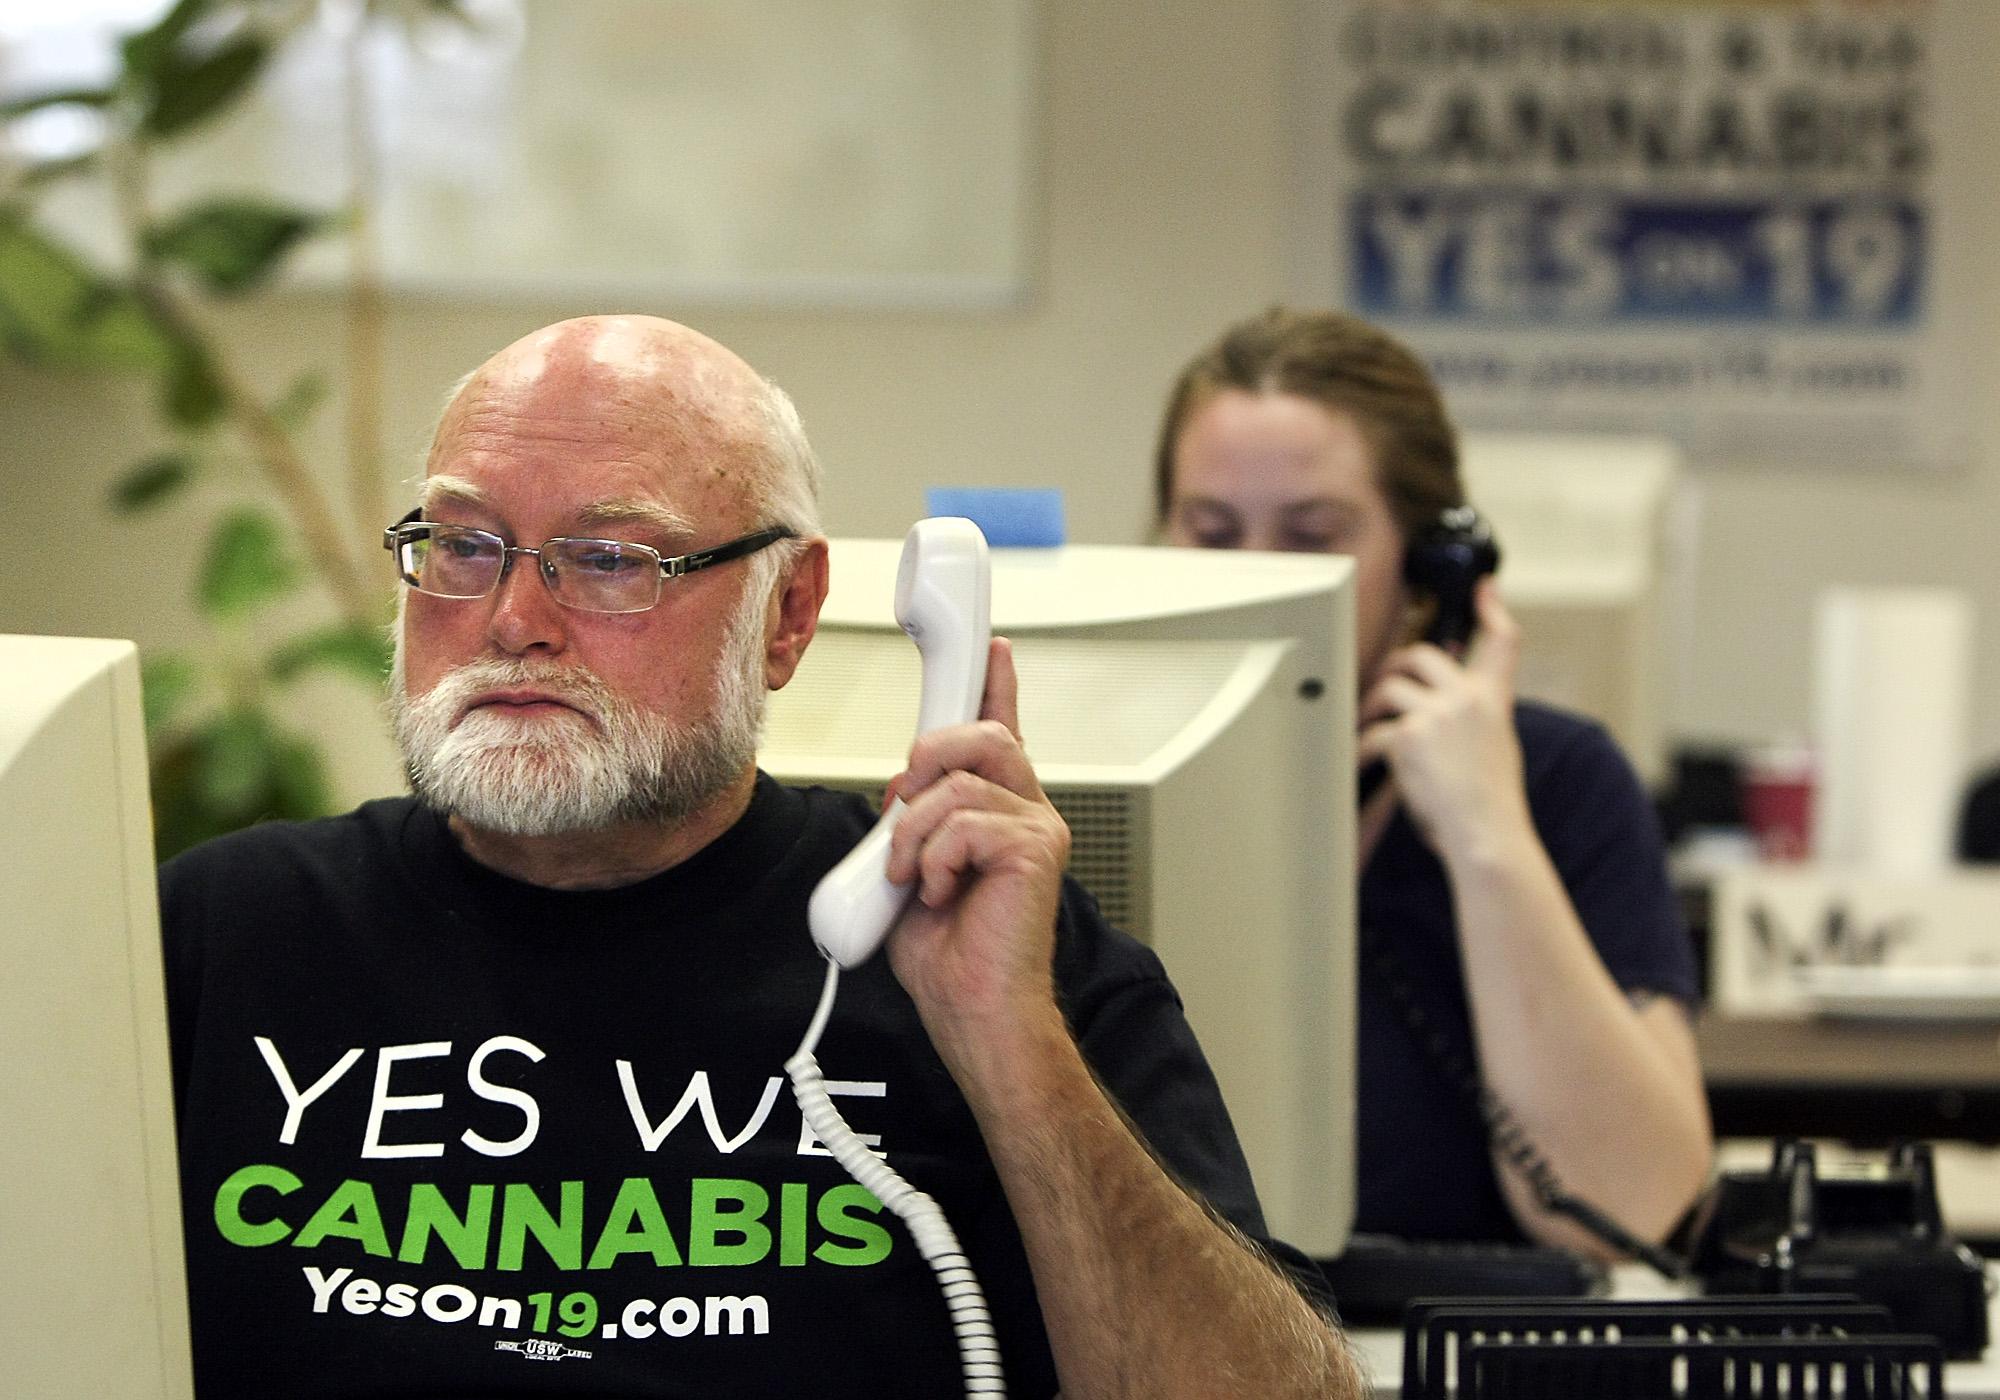 Volunteer Gregory Lyons, 63, of Oakland, makes calls at Oaksterdam University in support of Prop 19, a marijuana legalization initiative, in Oakland on Nov. 2 2010.